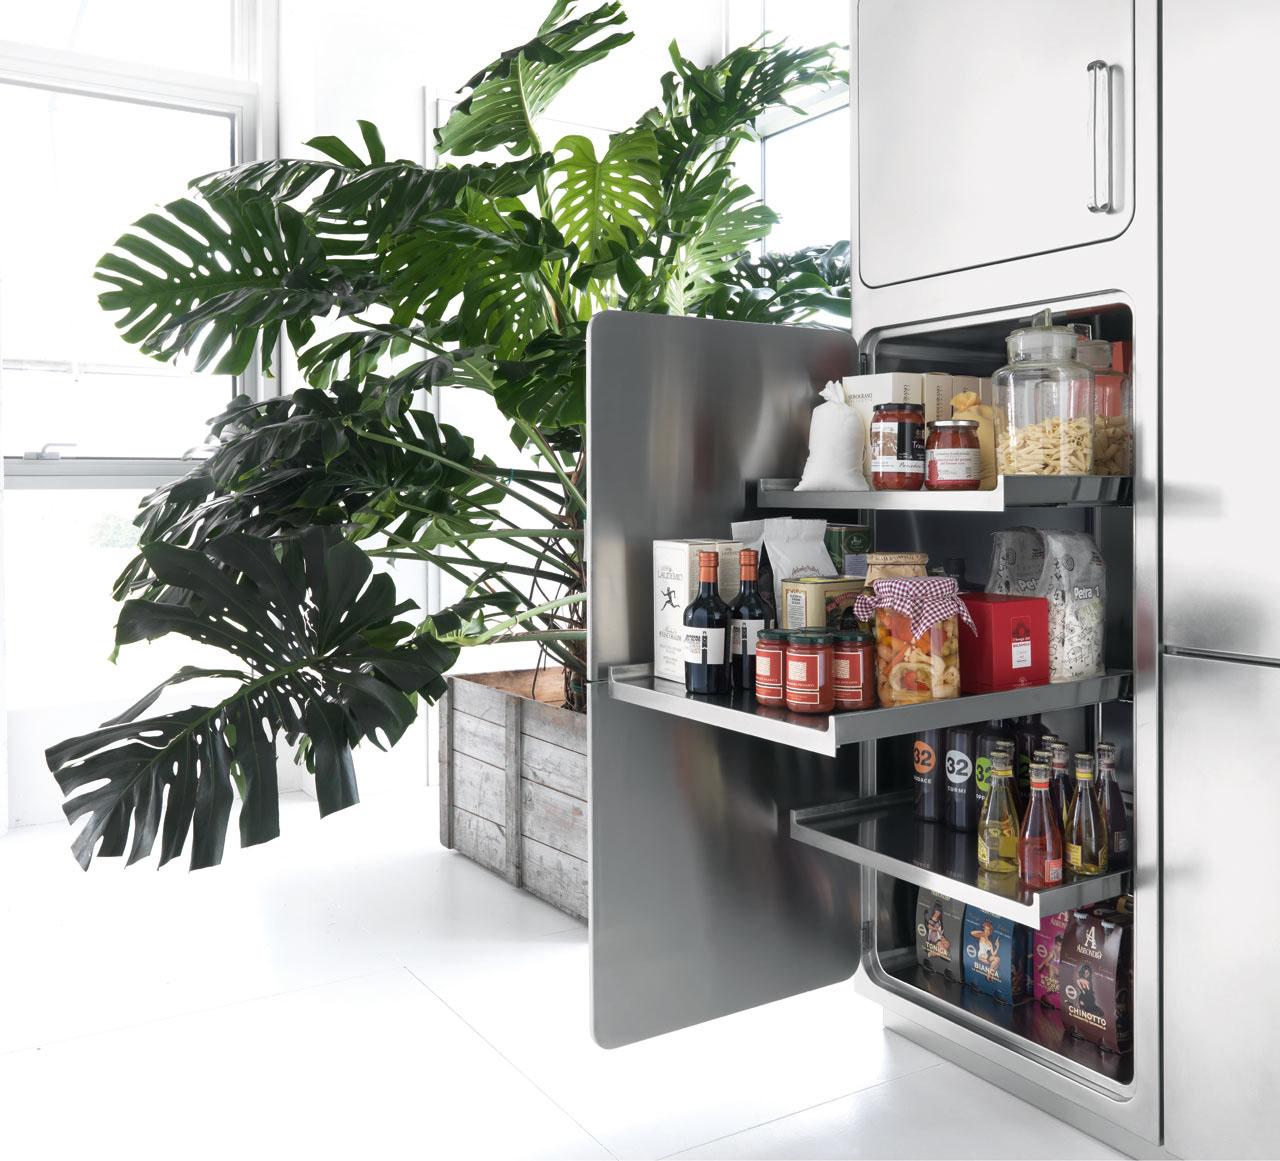 italian designed ergonomic and hygienic stainless steel kitchen stainless steel kitchen cabinets Stainless Steel Kitchen Cabinets